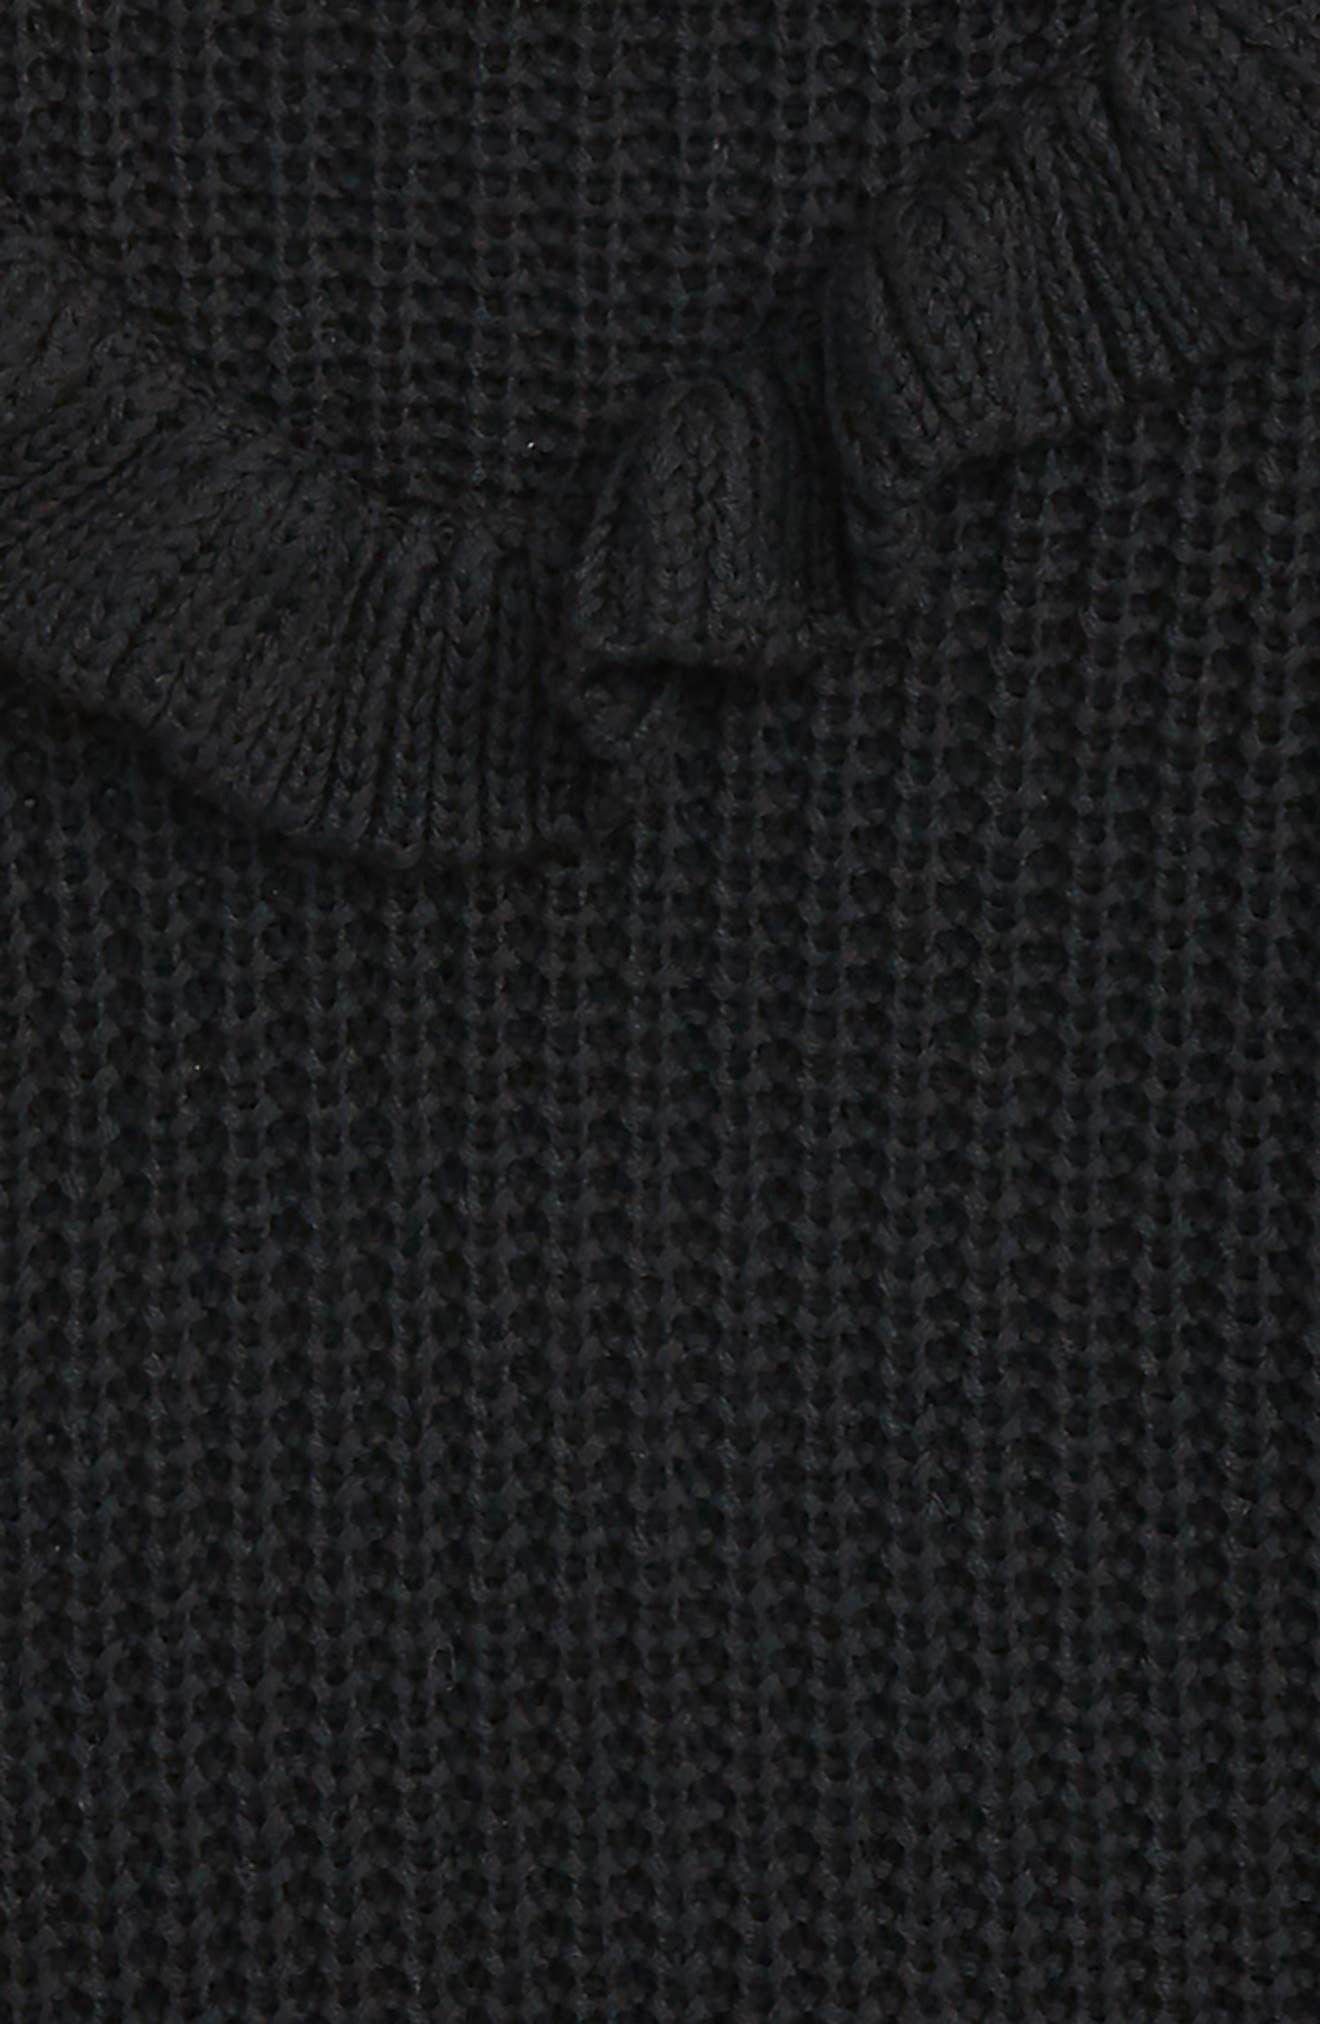 BLANCNYC Ruffle Sweater,                             Alternate thumbnail 3, color,